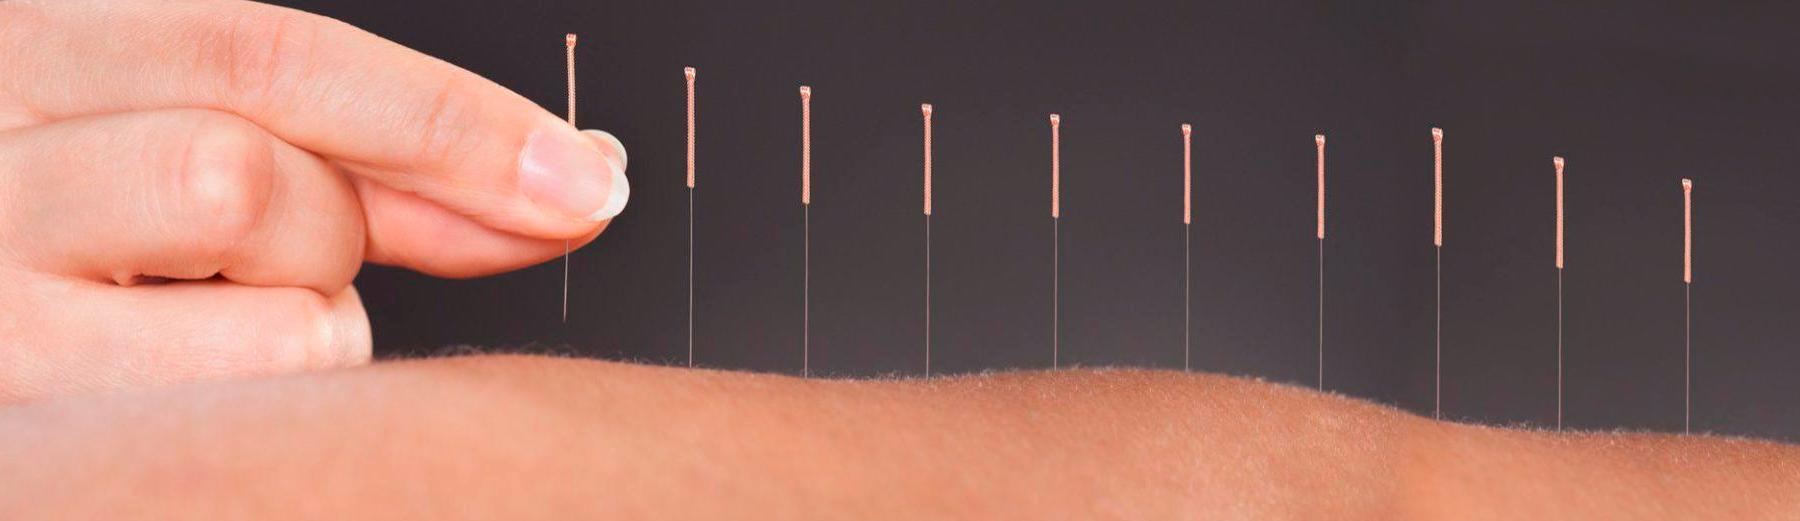 chist pe tratamentul cu laser al coloanei vertebrale